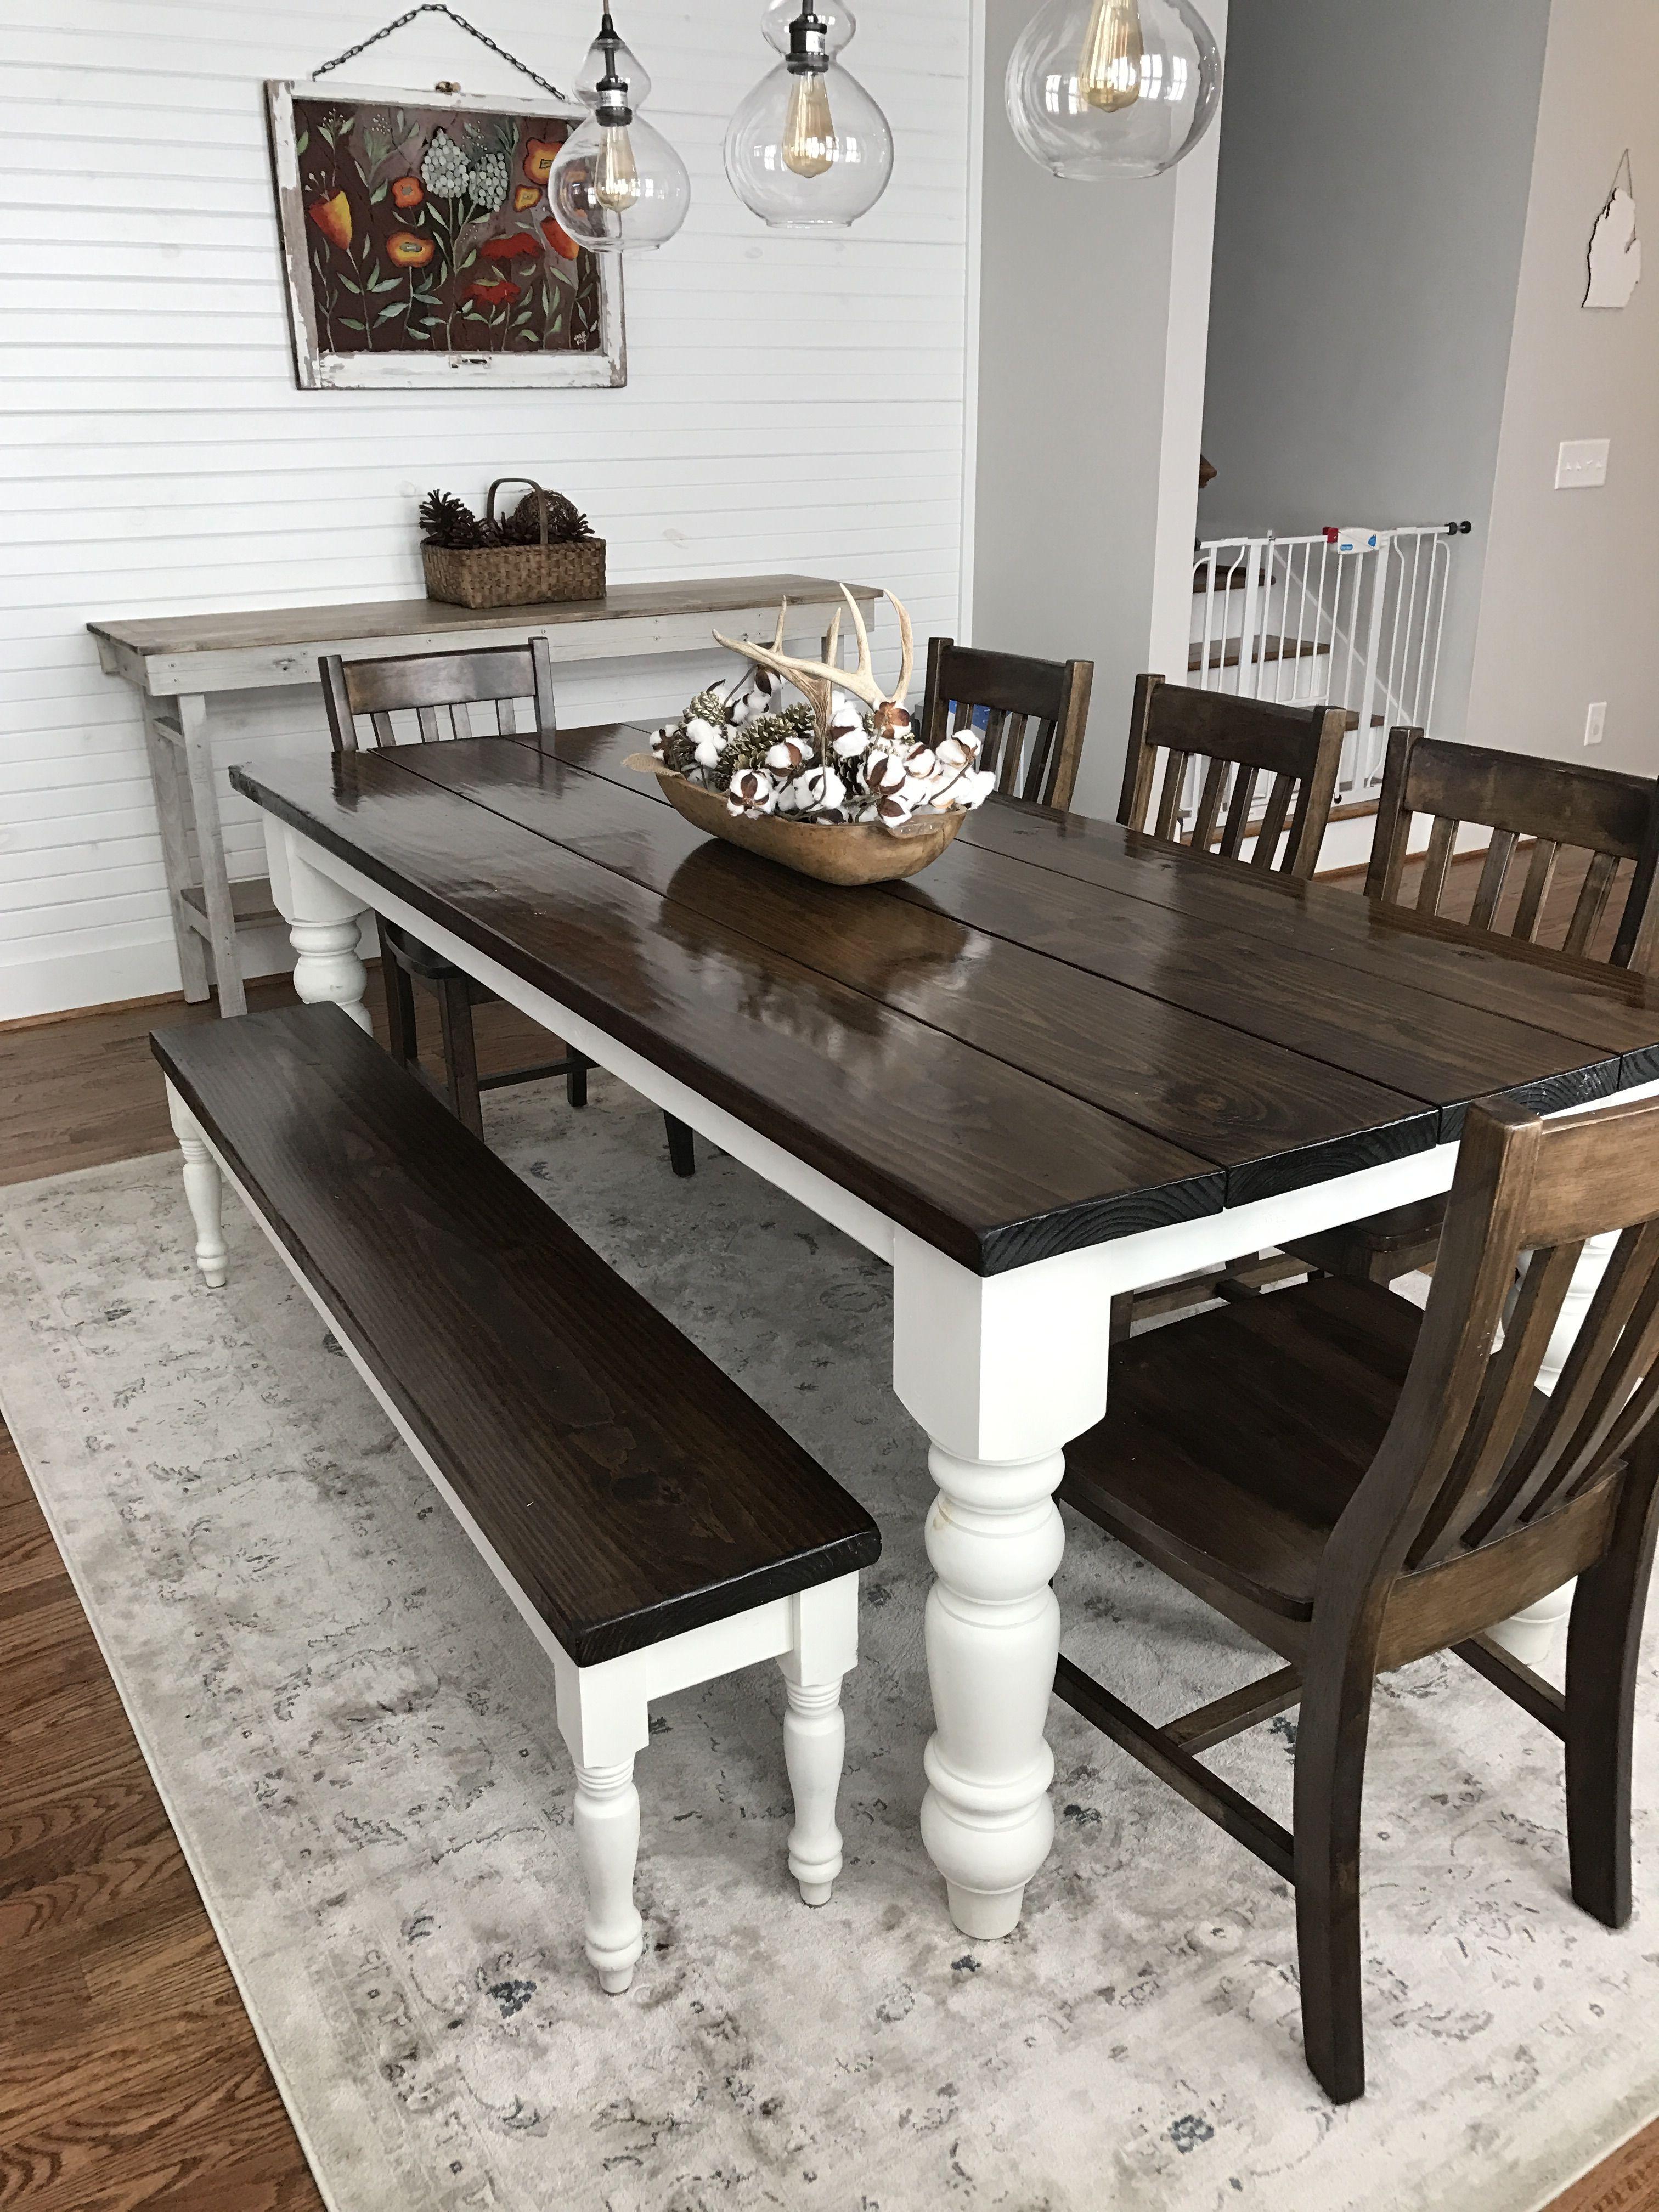 baluster turned leg table in 2018 | decor ideas | pinterest | dining